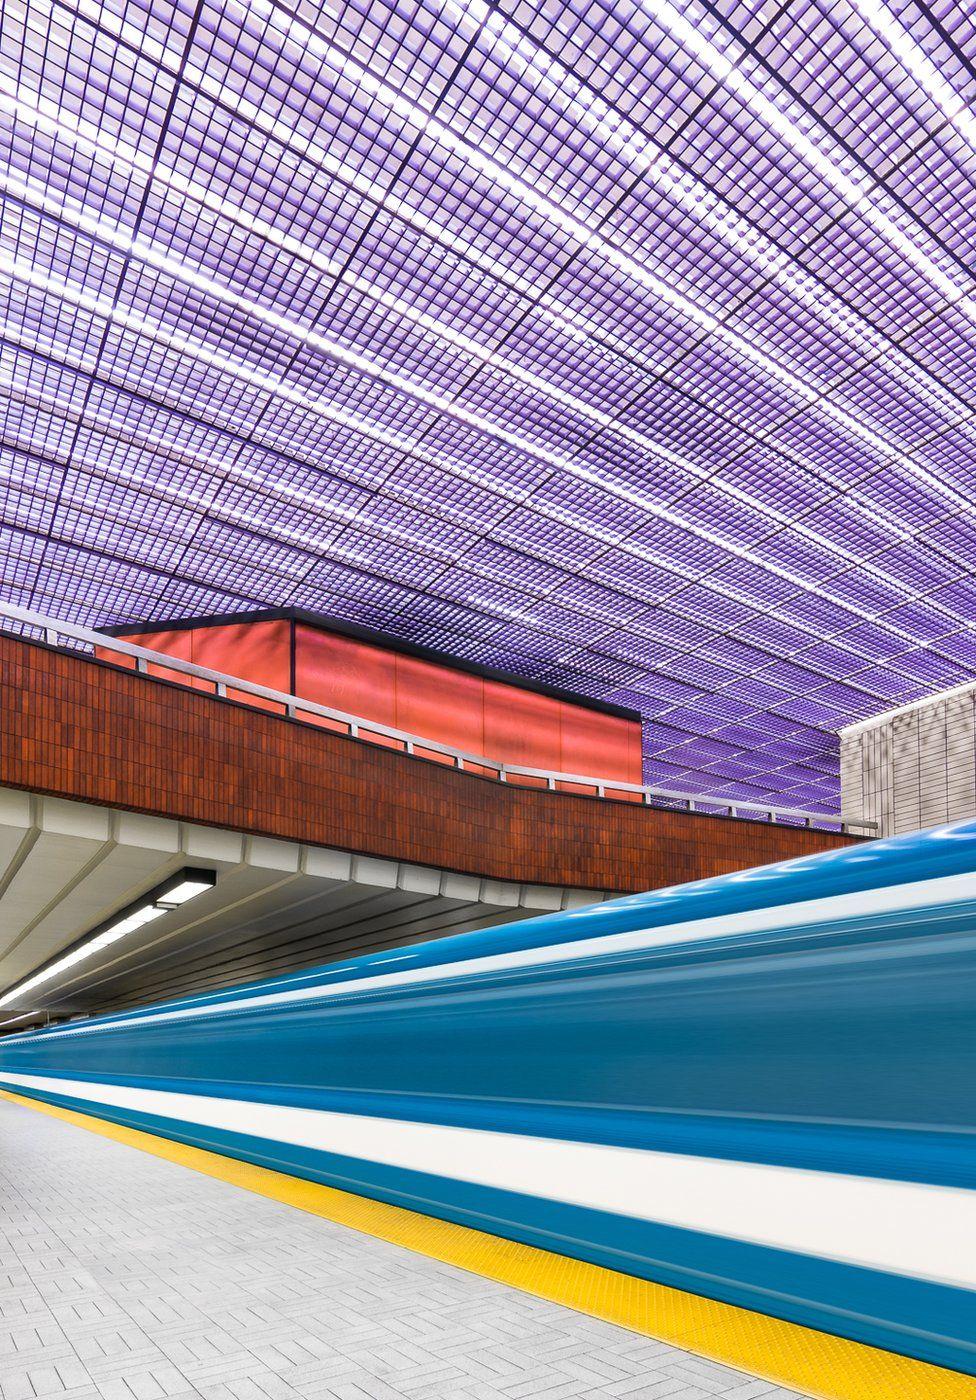 Sherbrooke station